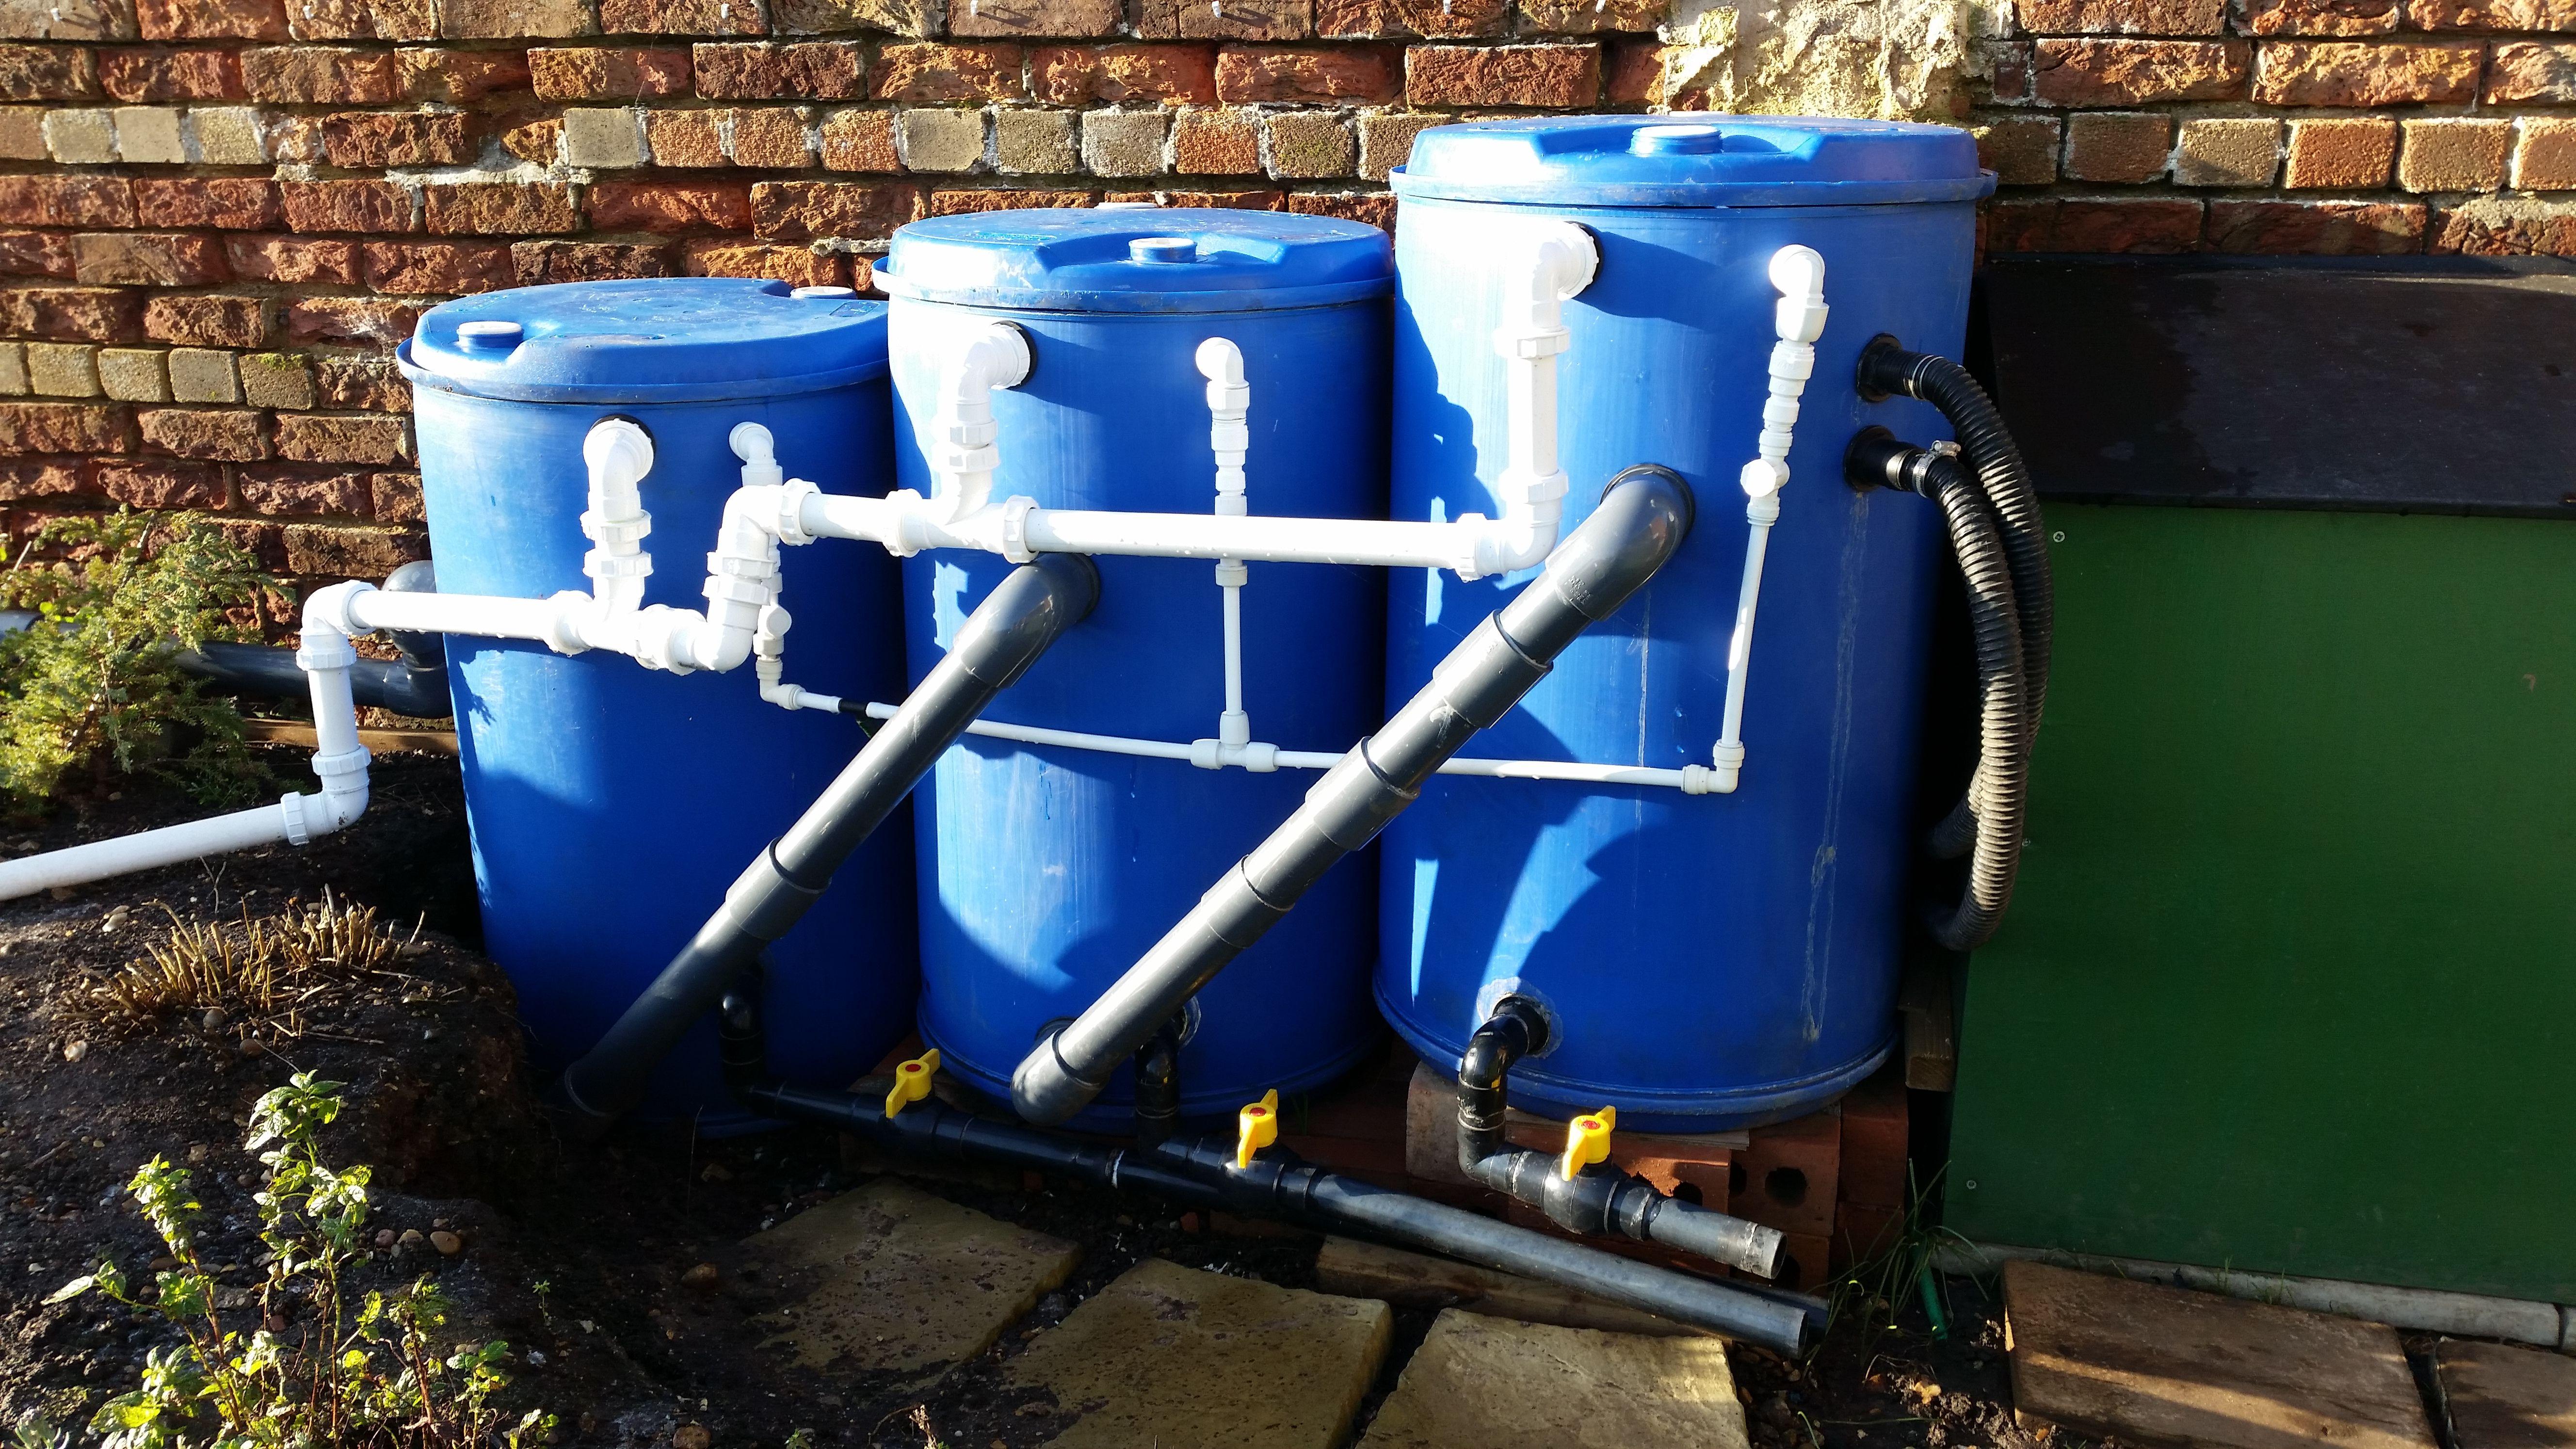 Diy pond filters tanks pinterest for Koi pond pool filter